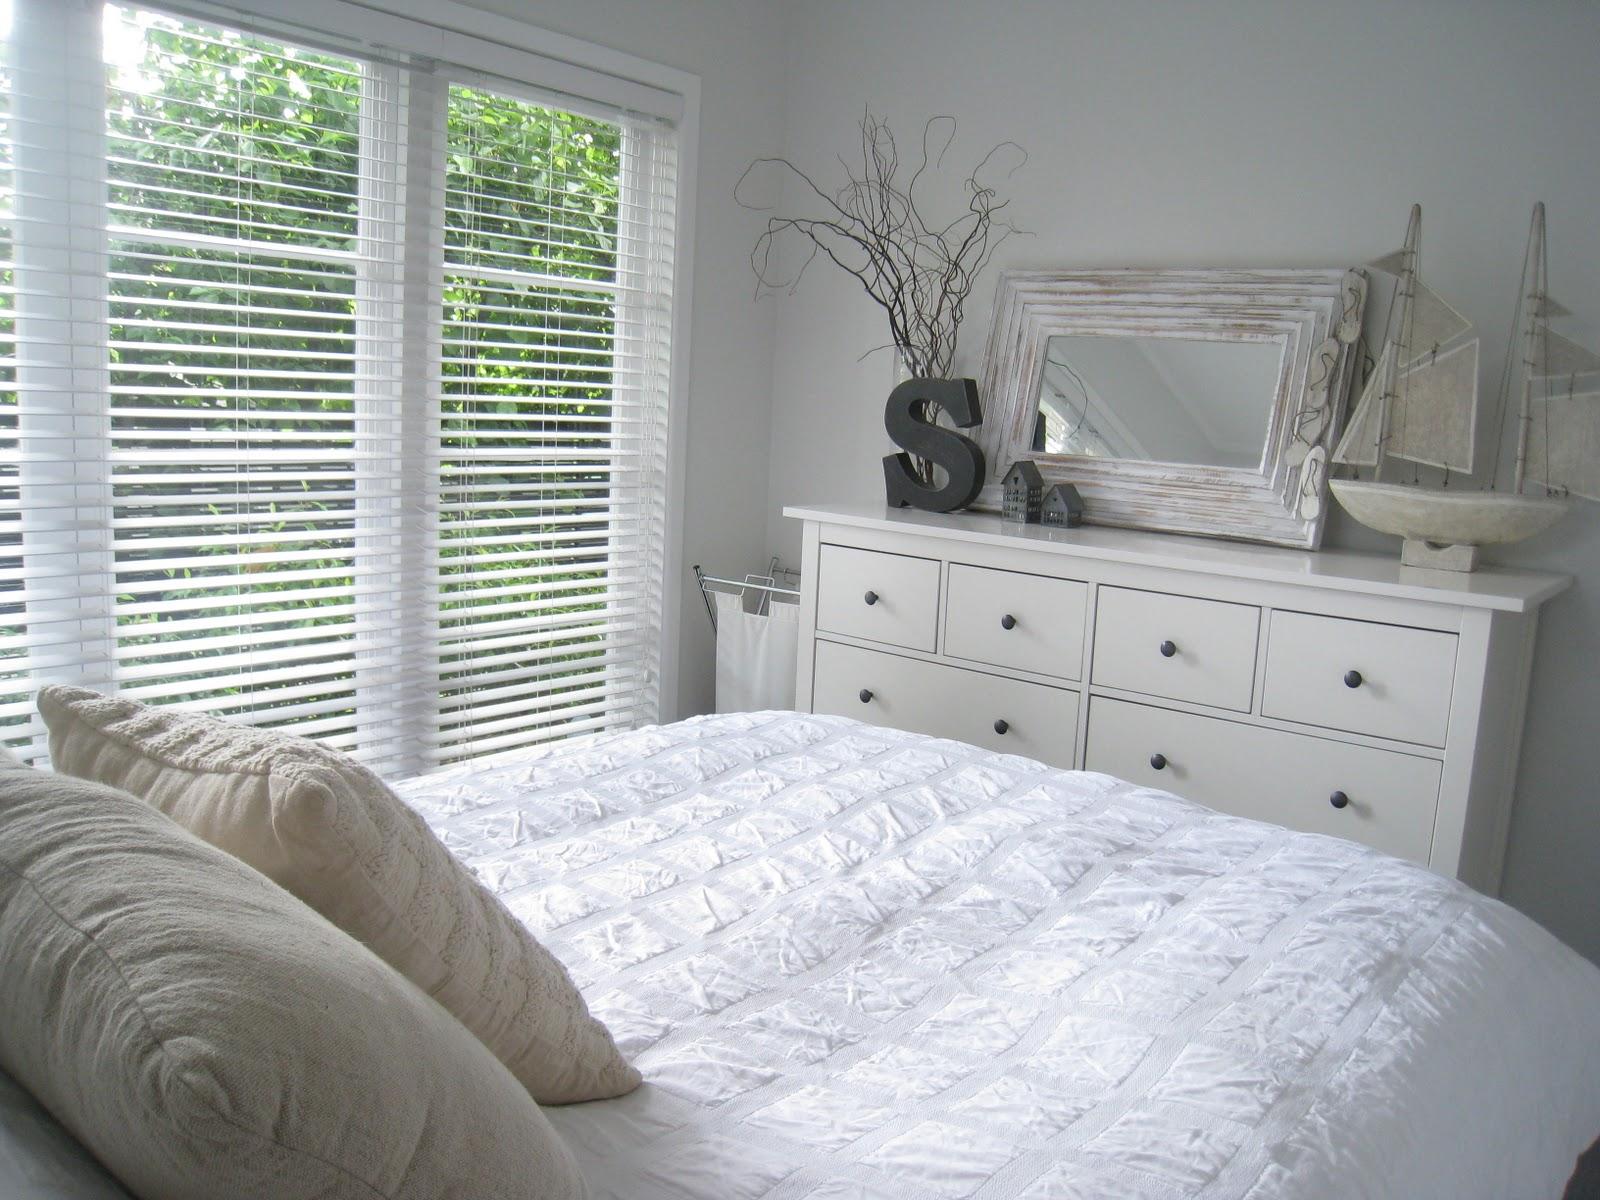 hemnes ikea furniture. ikea white hemnes bedroom furniture photo - 5 r